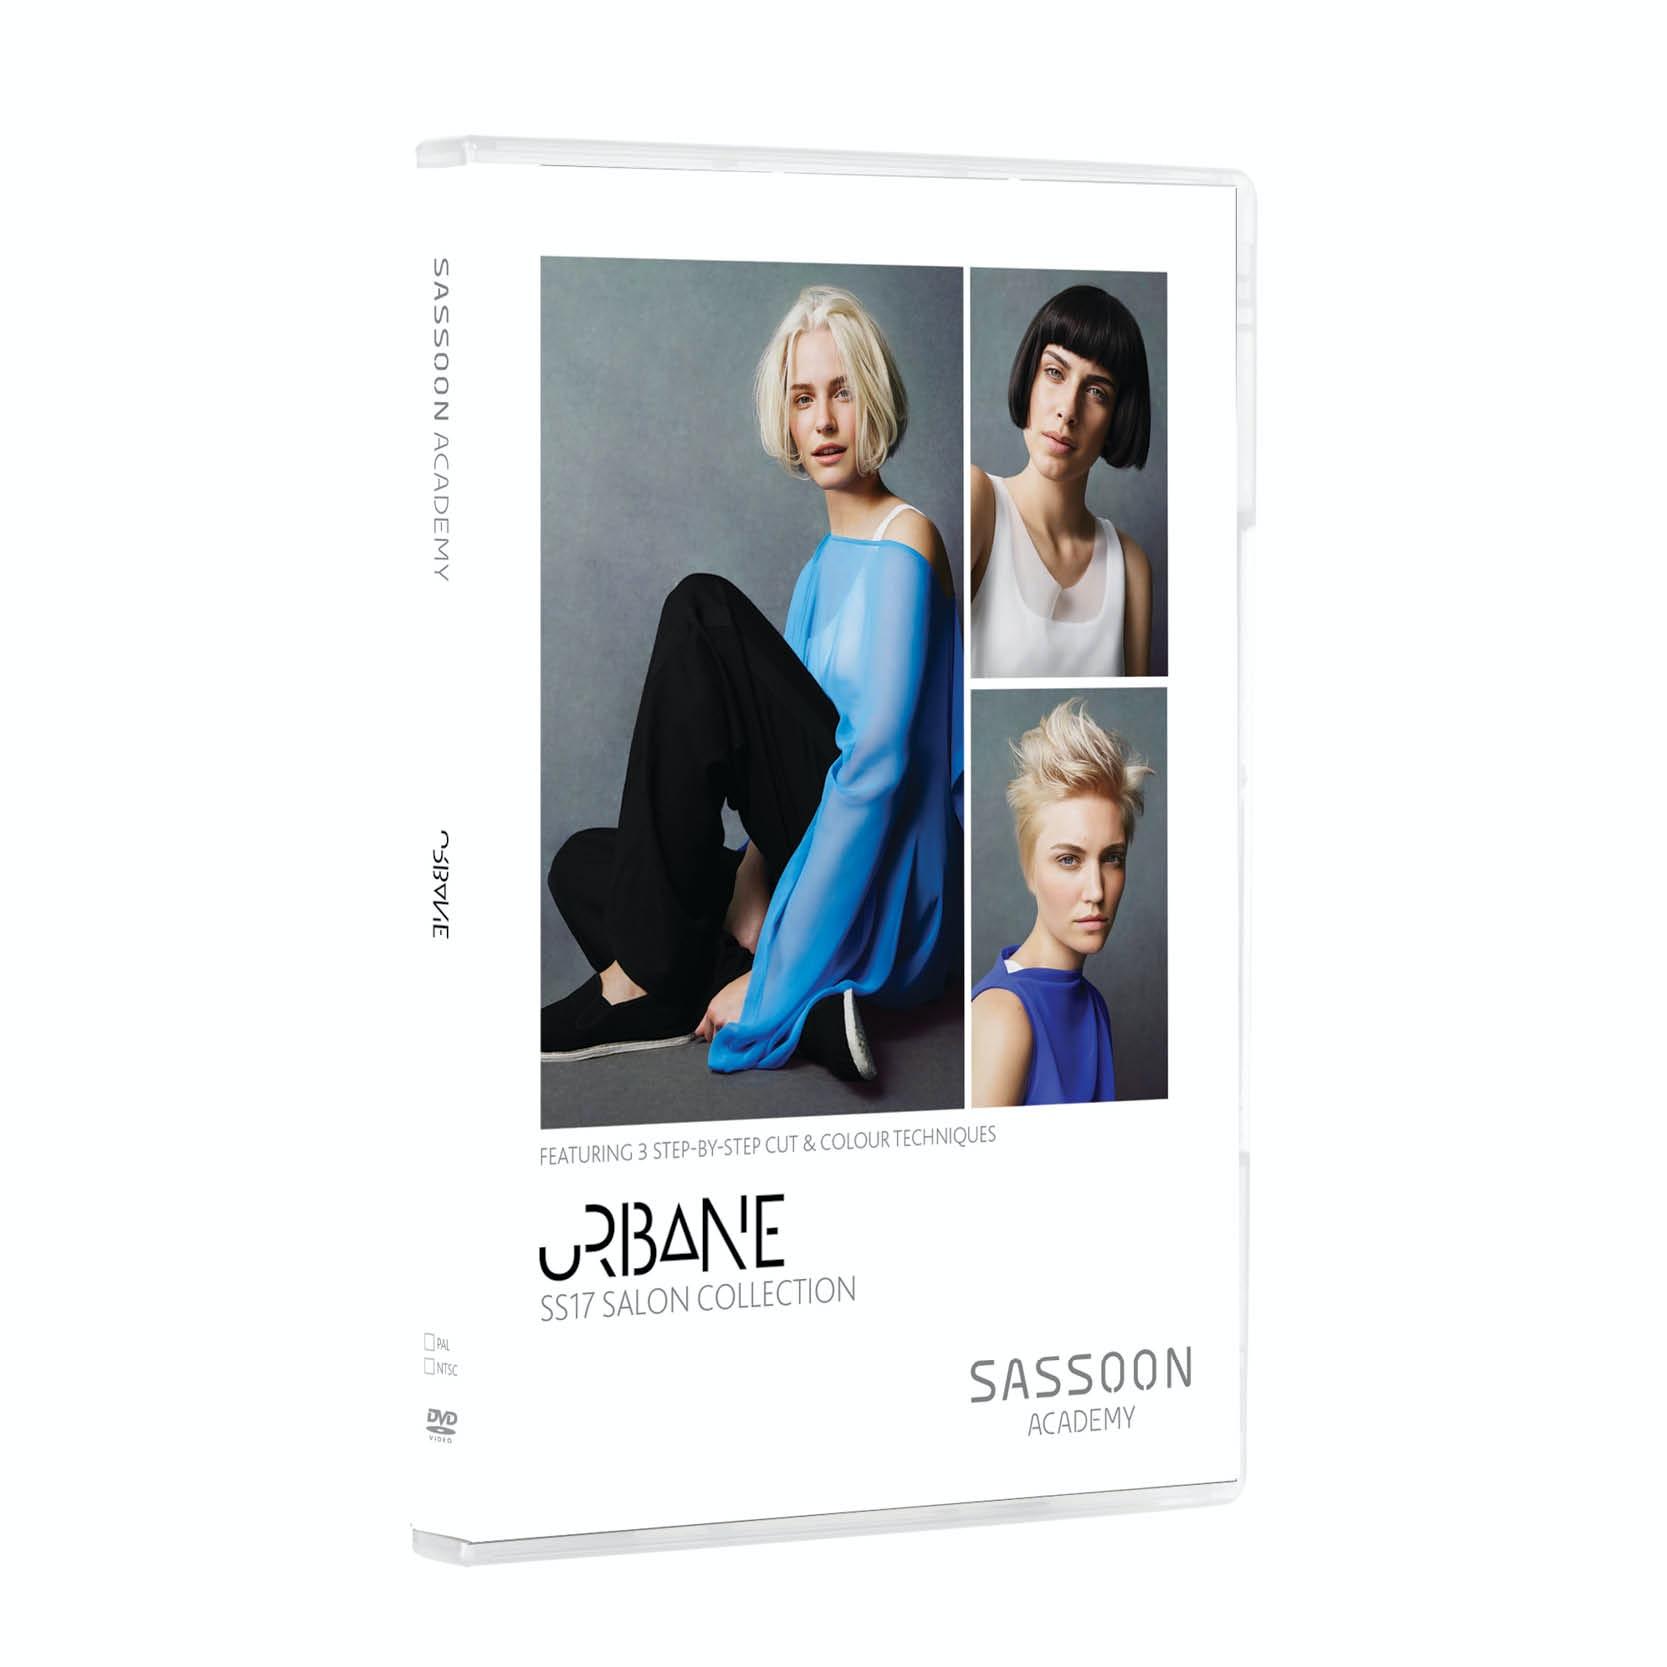 Urbane | SS17 Salon Collection